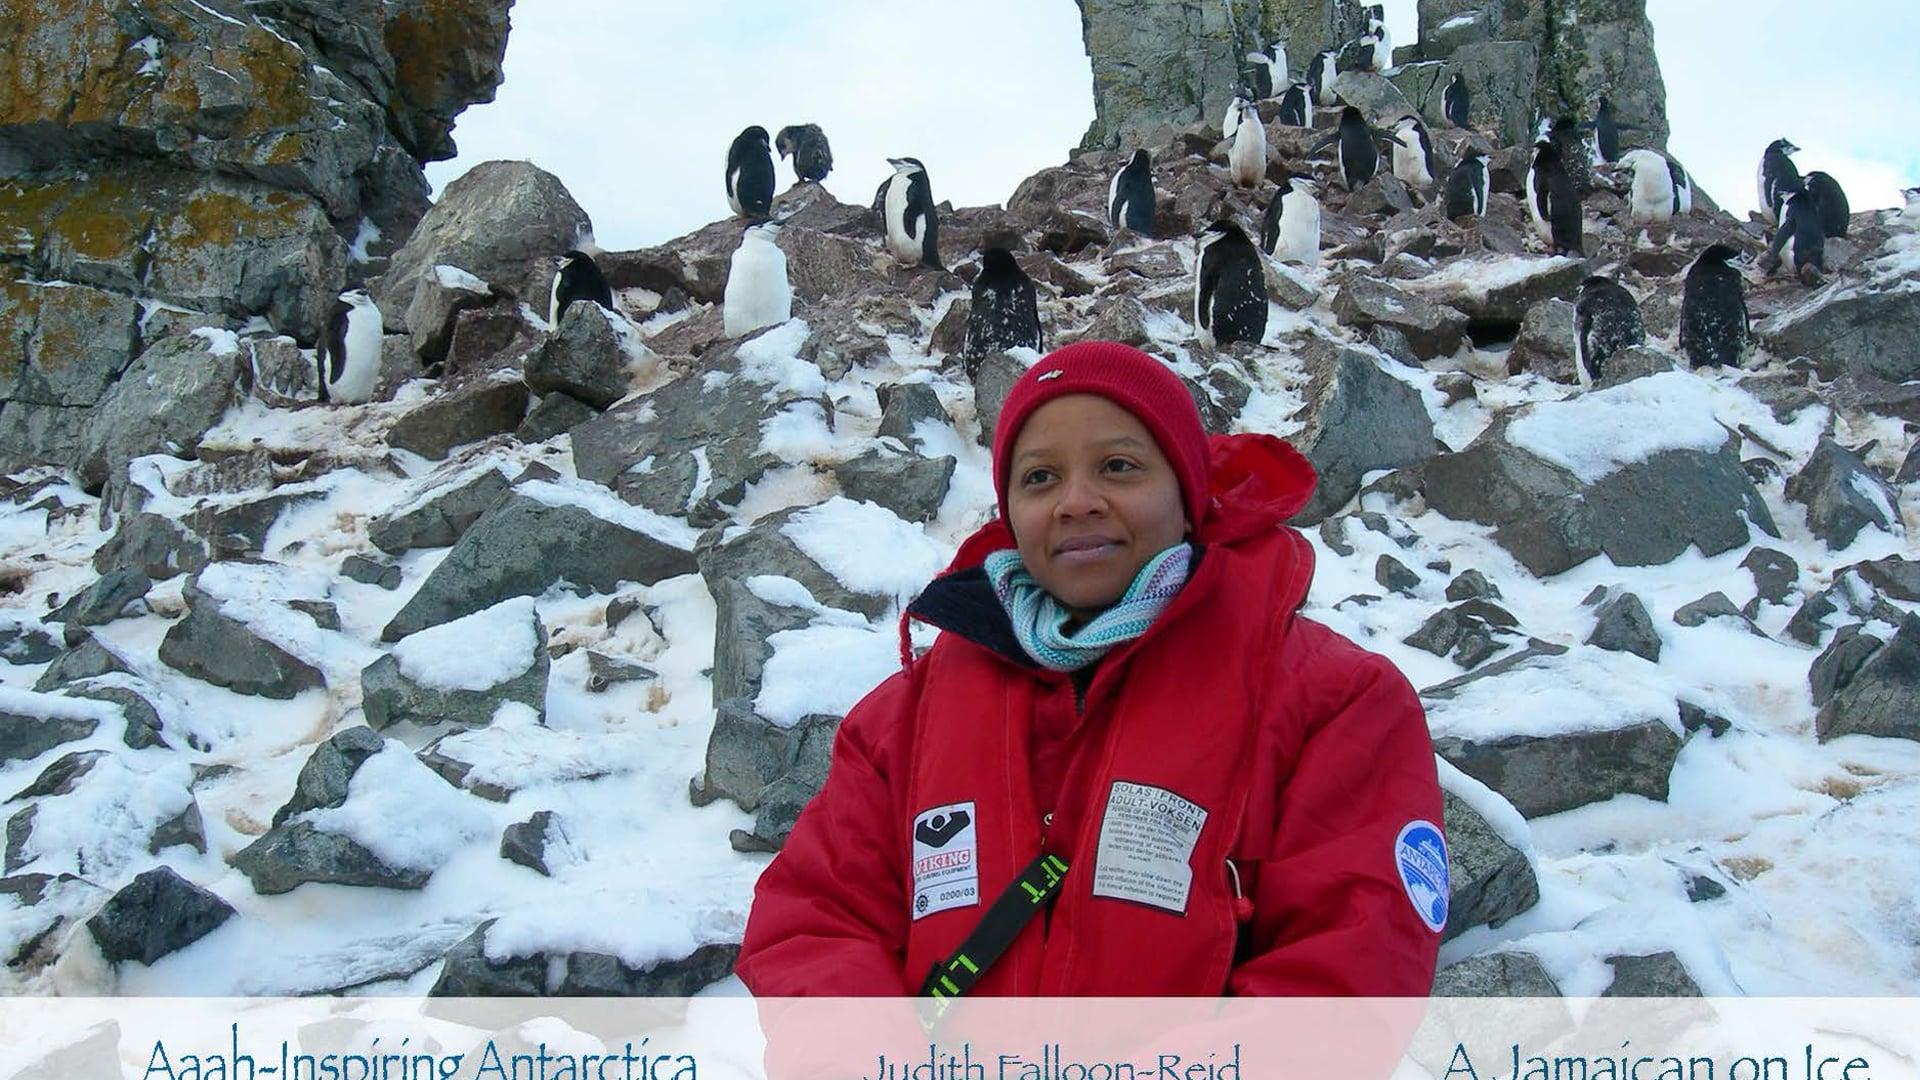 Aaah-Inspiring Antarctica - A Jamaican on Ice